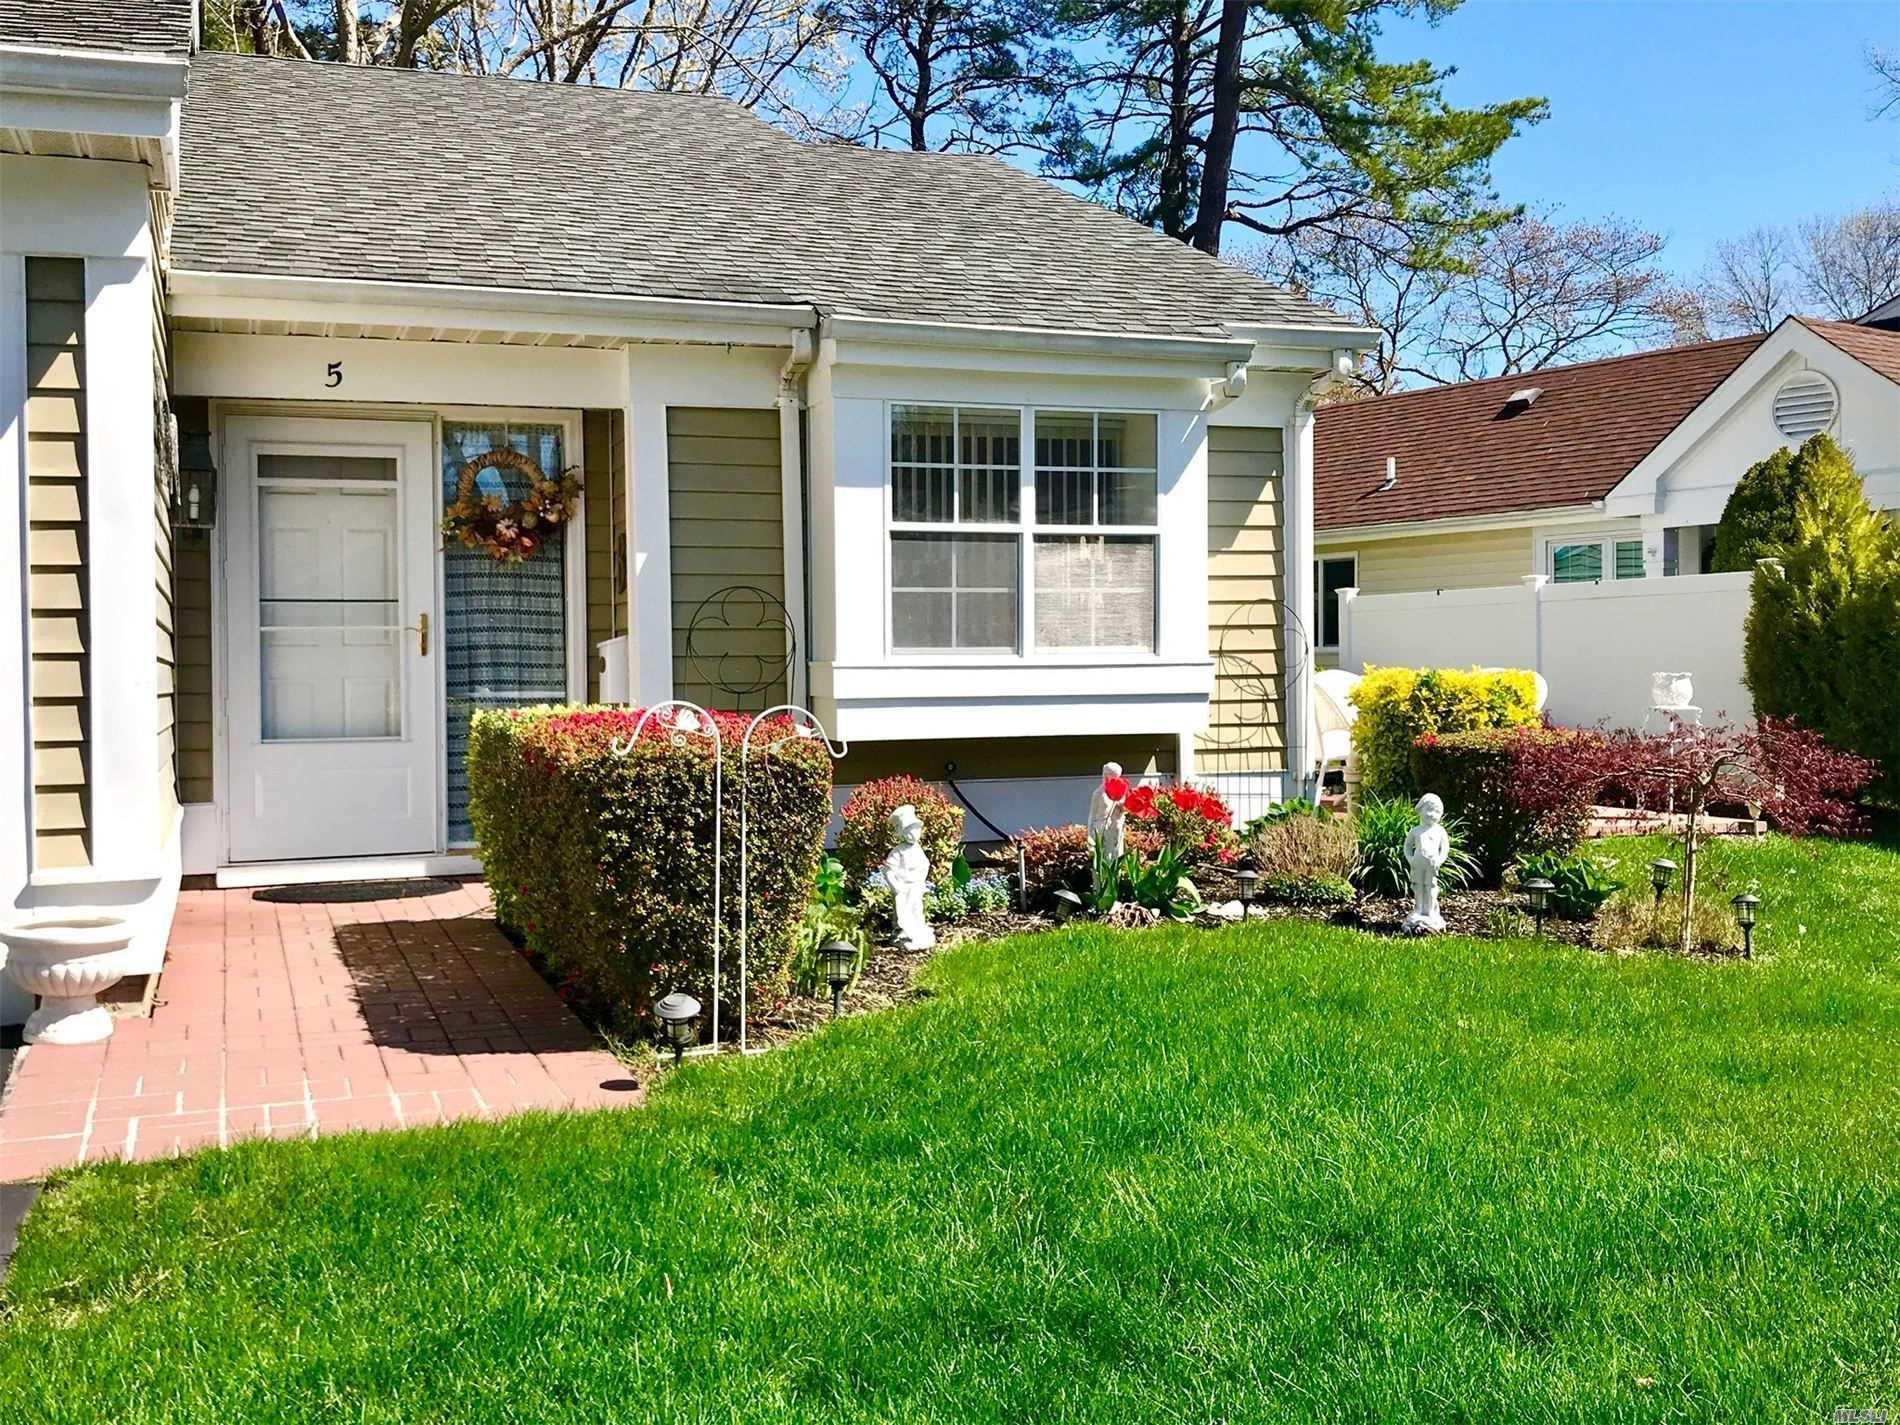 Property for sale at 5 Douglaston Court, Ridge NY 11961, Ridge,  New York 11961